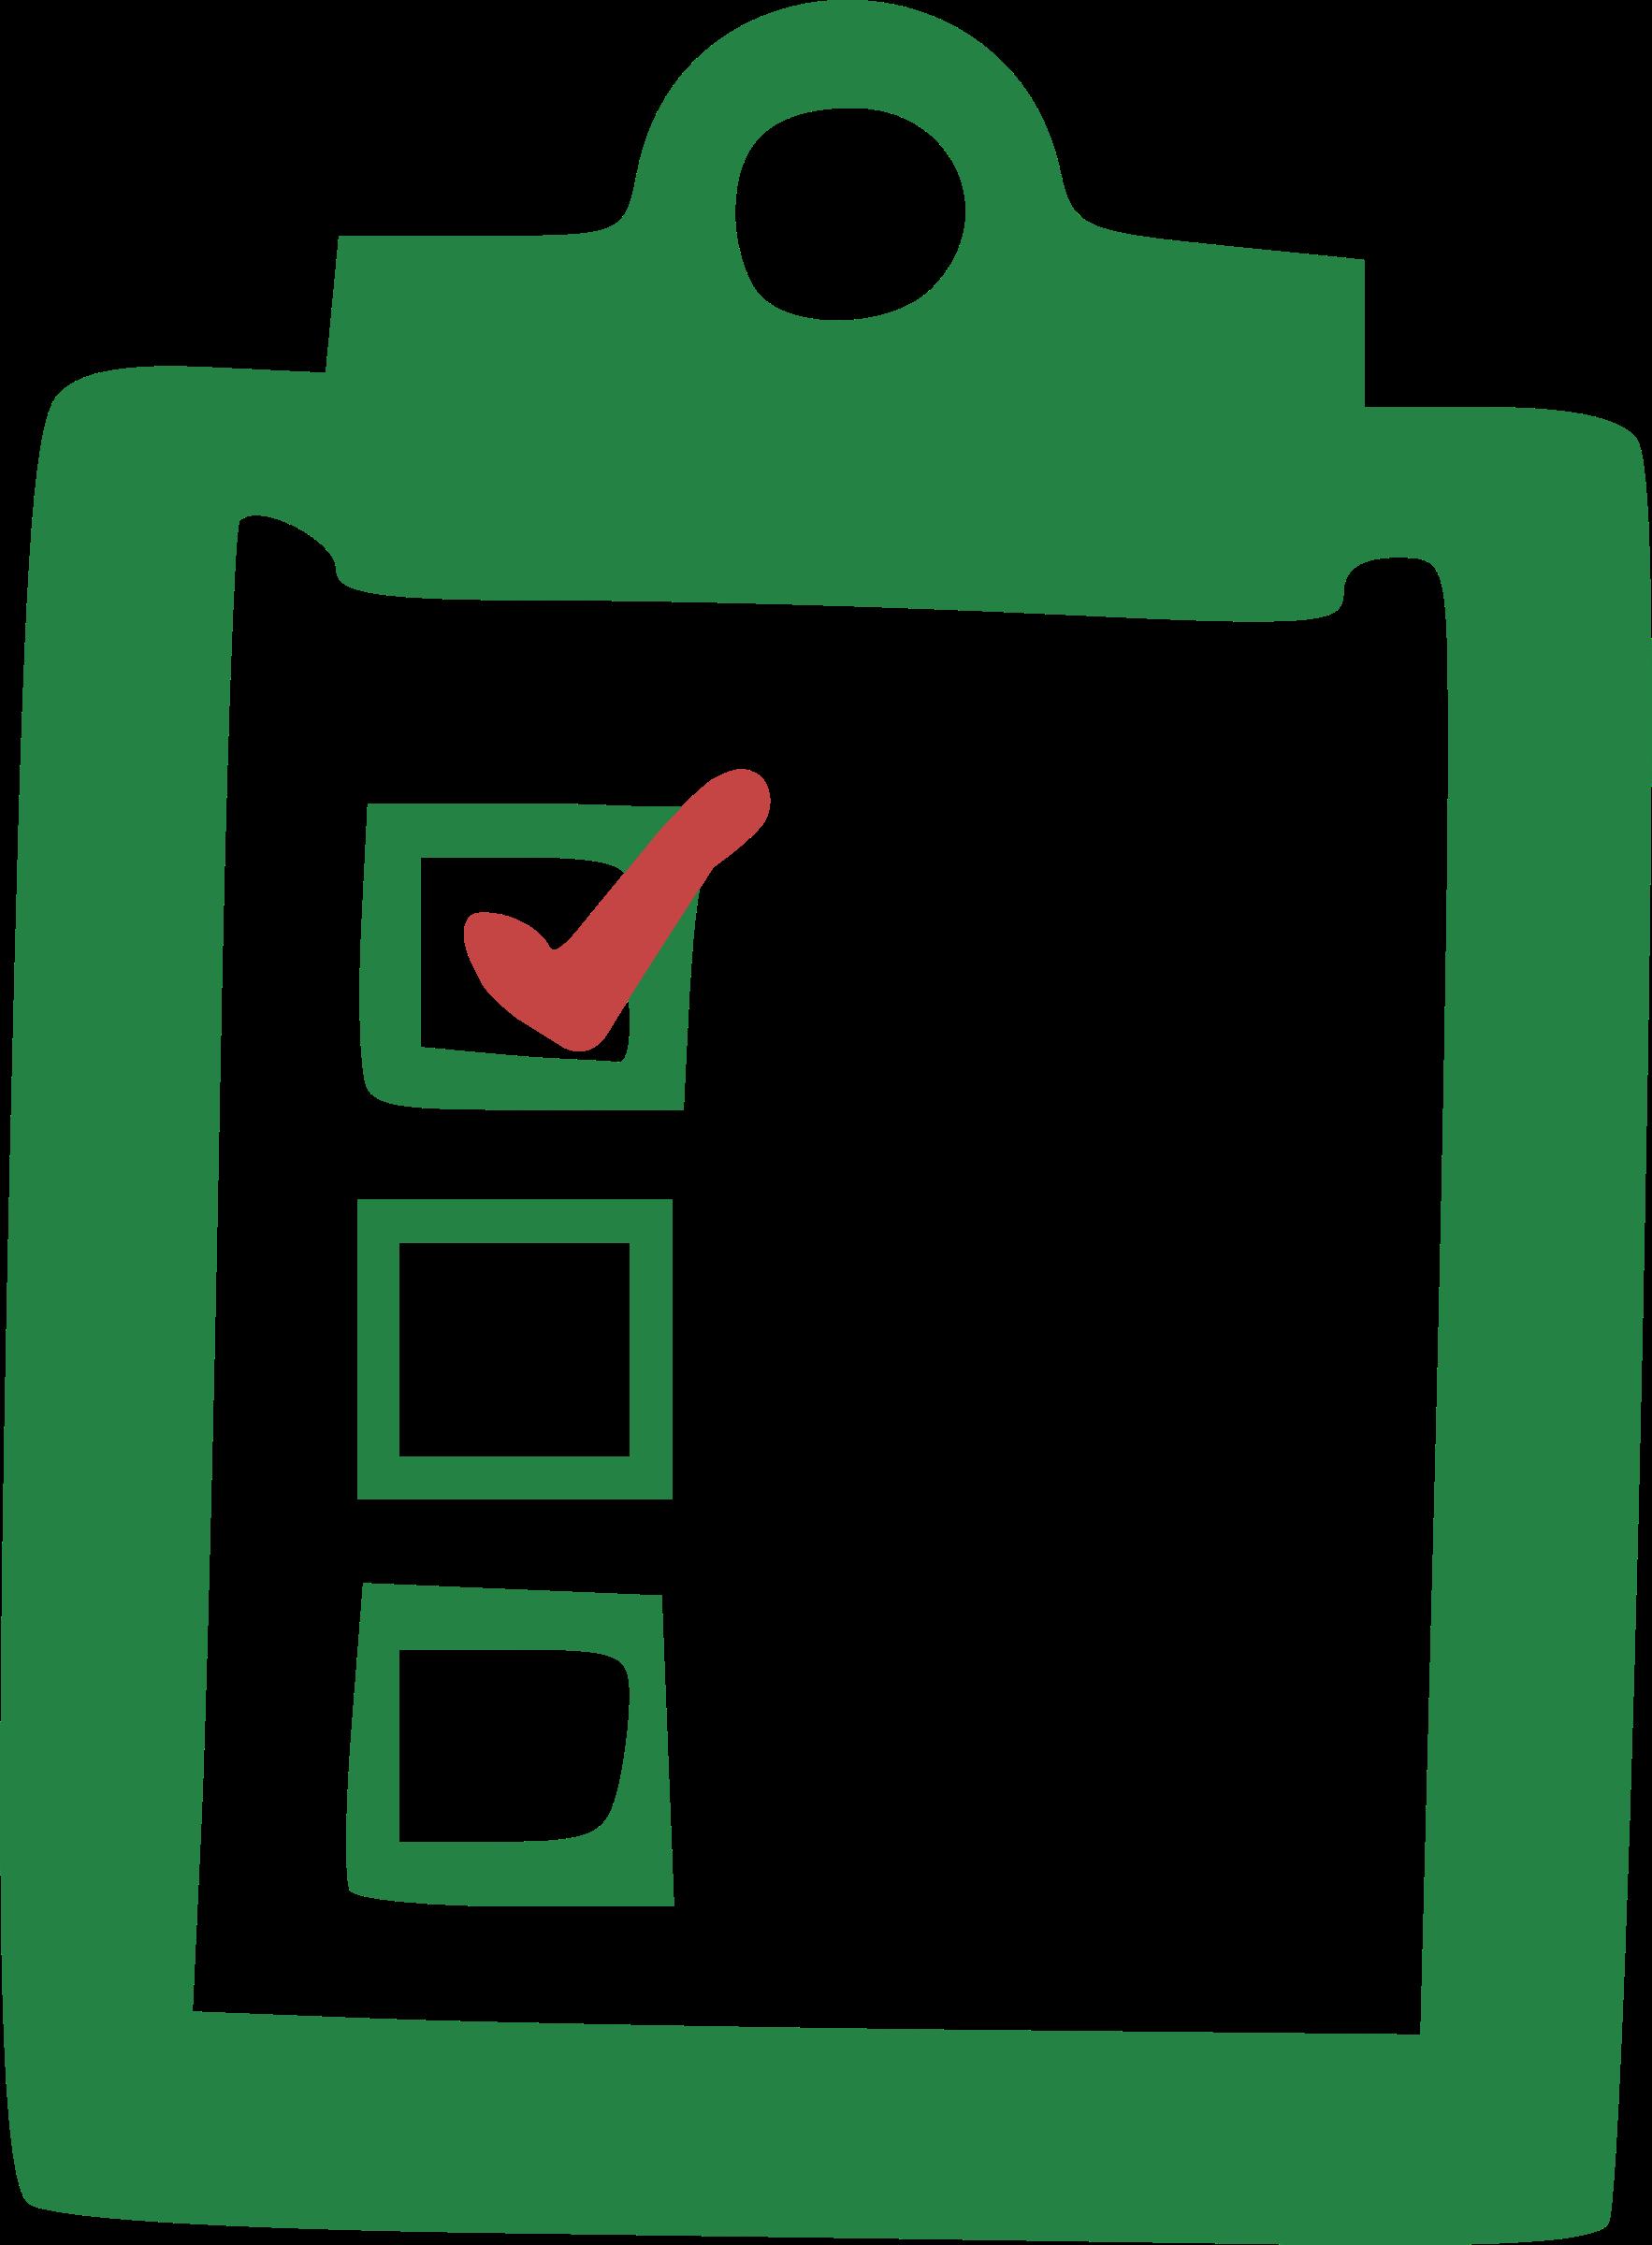 jpg transparent download Checklist clipart. Big image png.